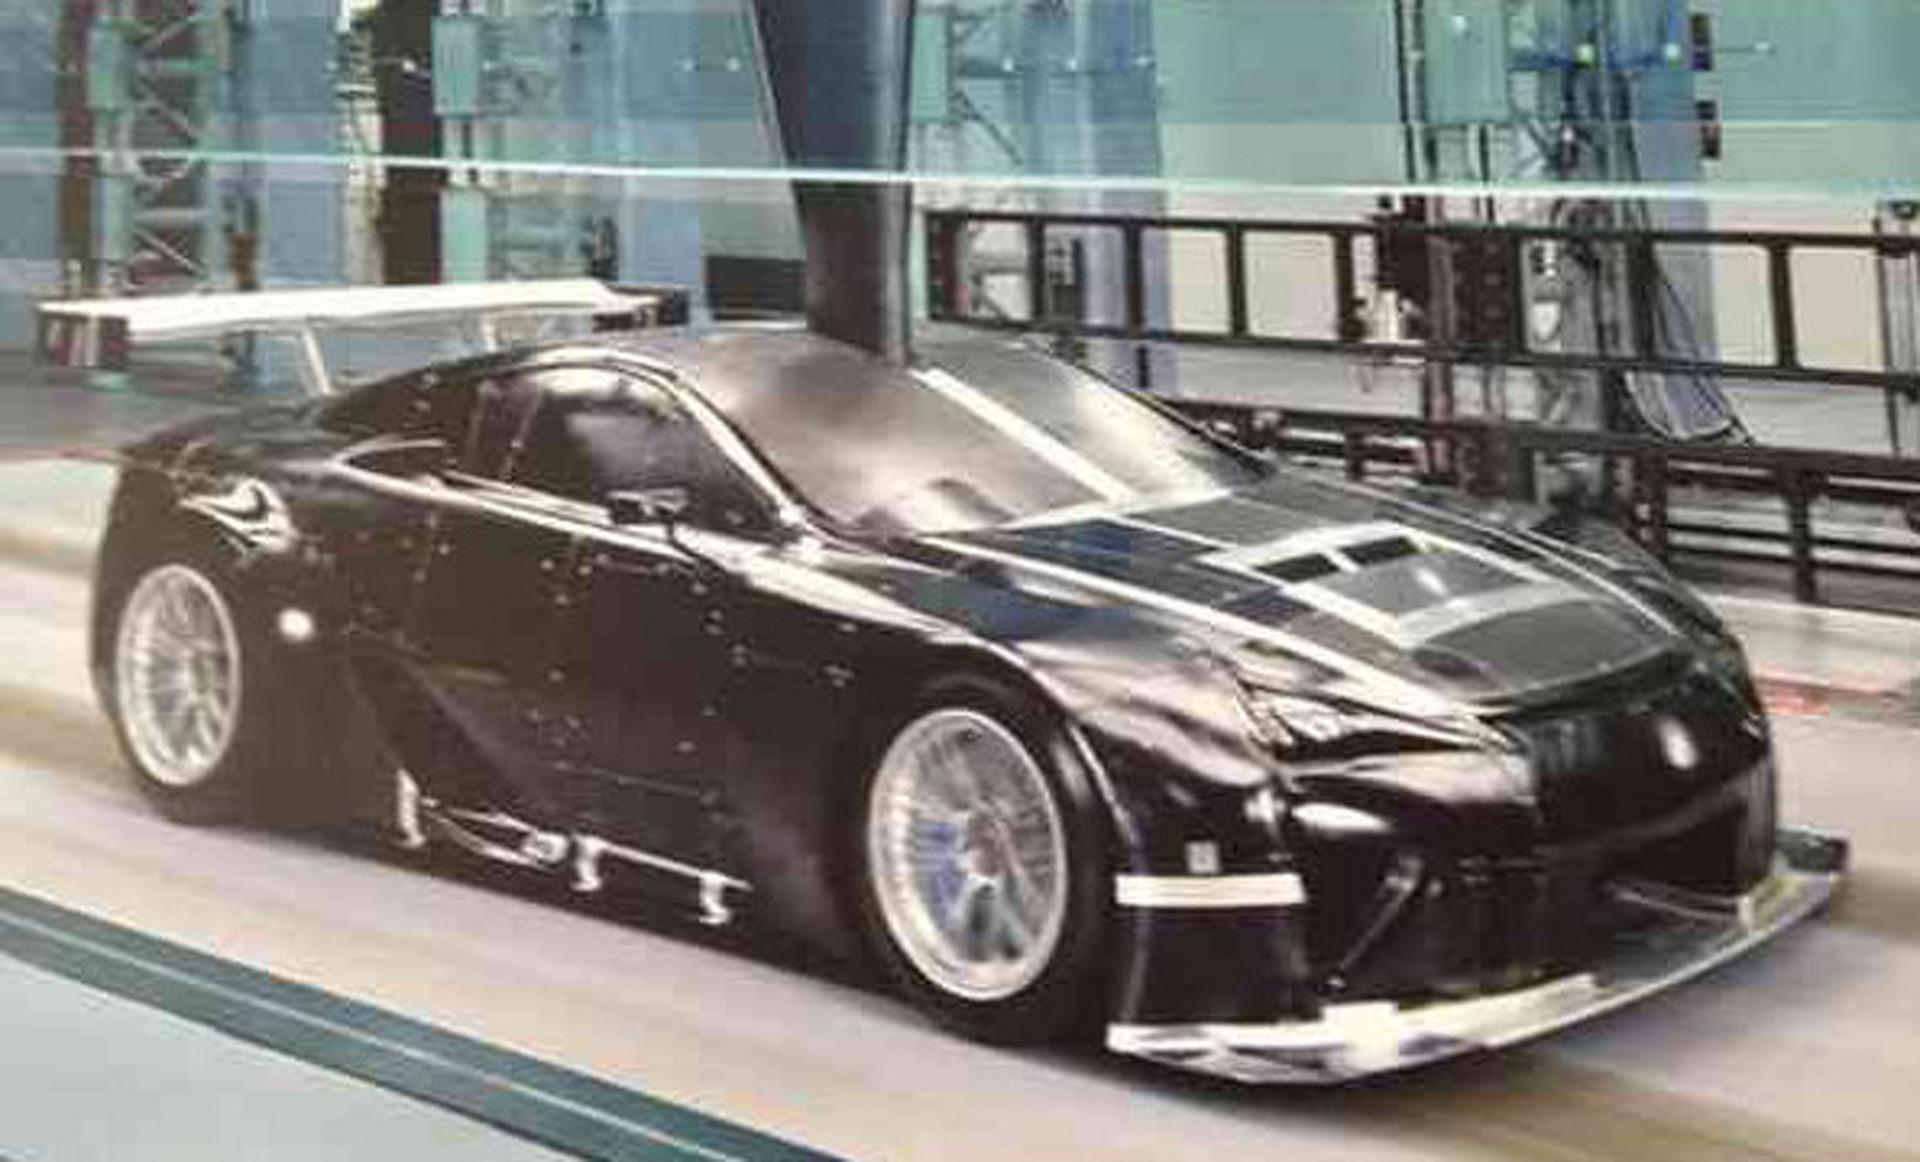 Lexus LFA Racer is the Stuff of Car Nerds' Dreams